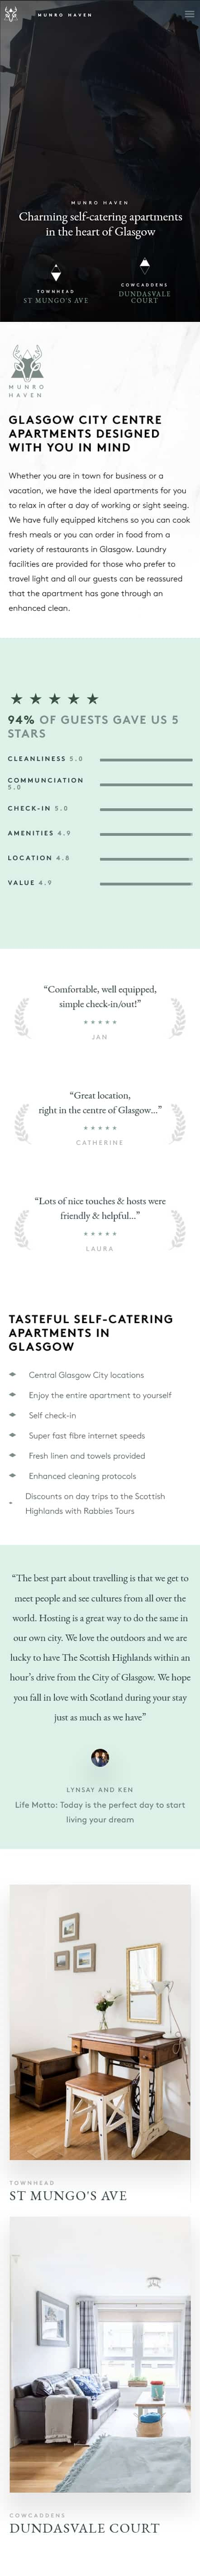 Glasgow booking website developers